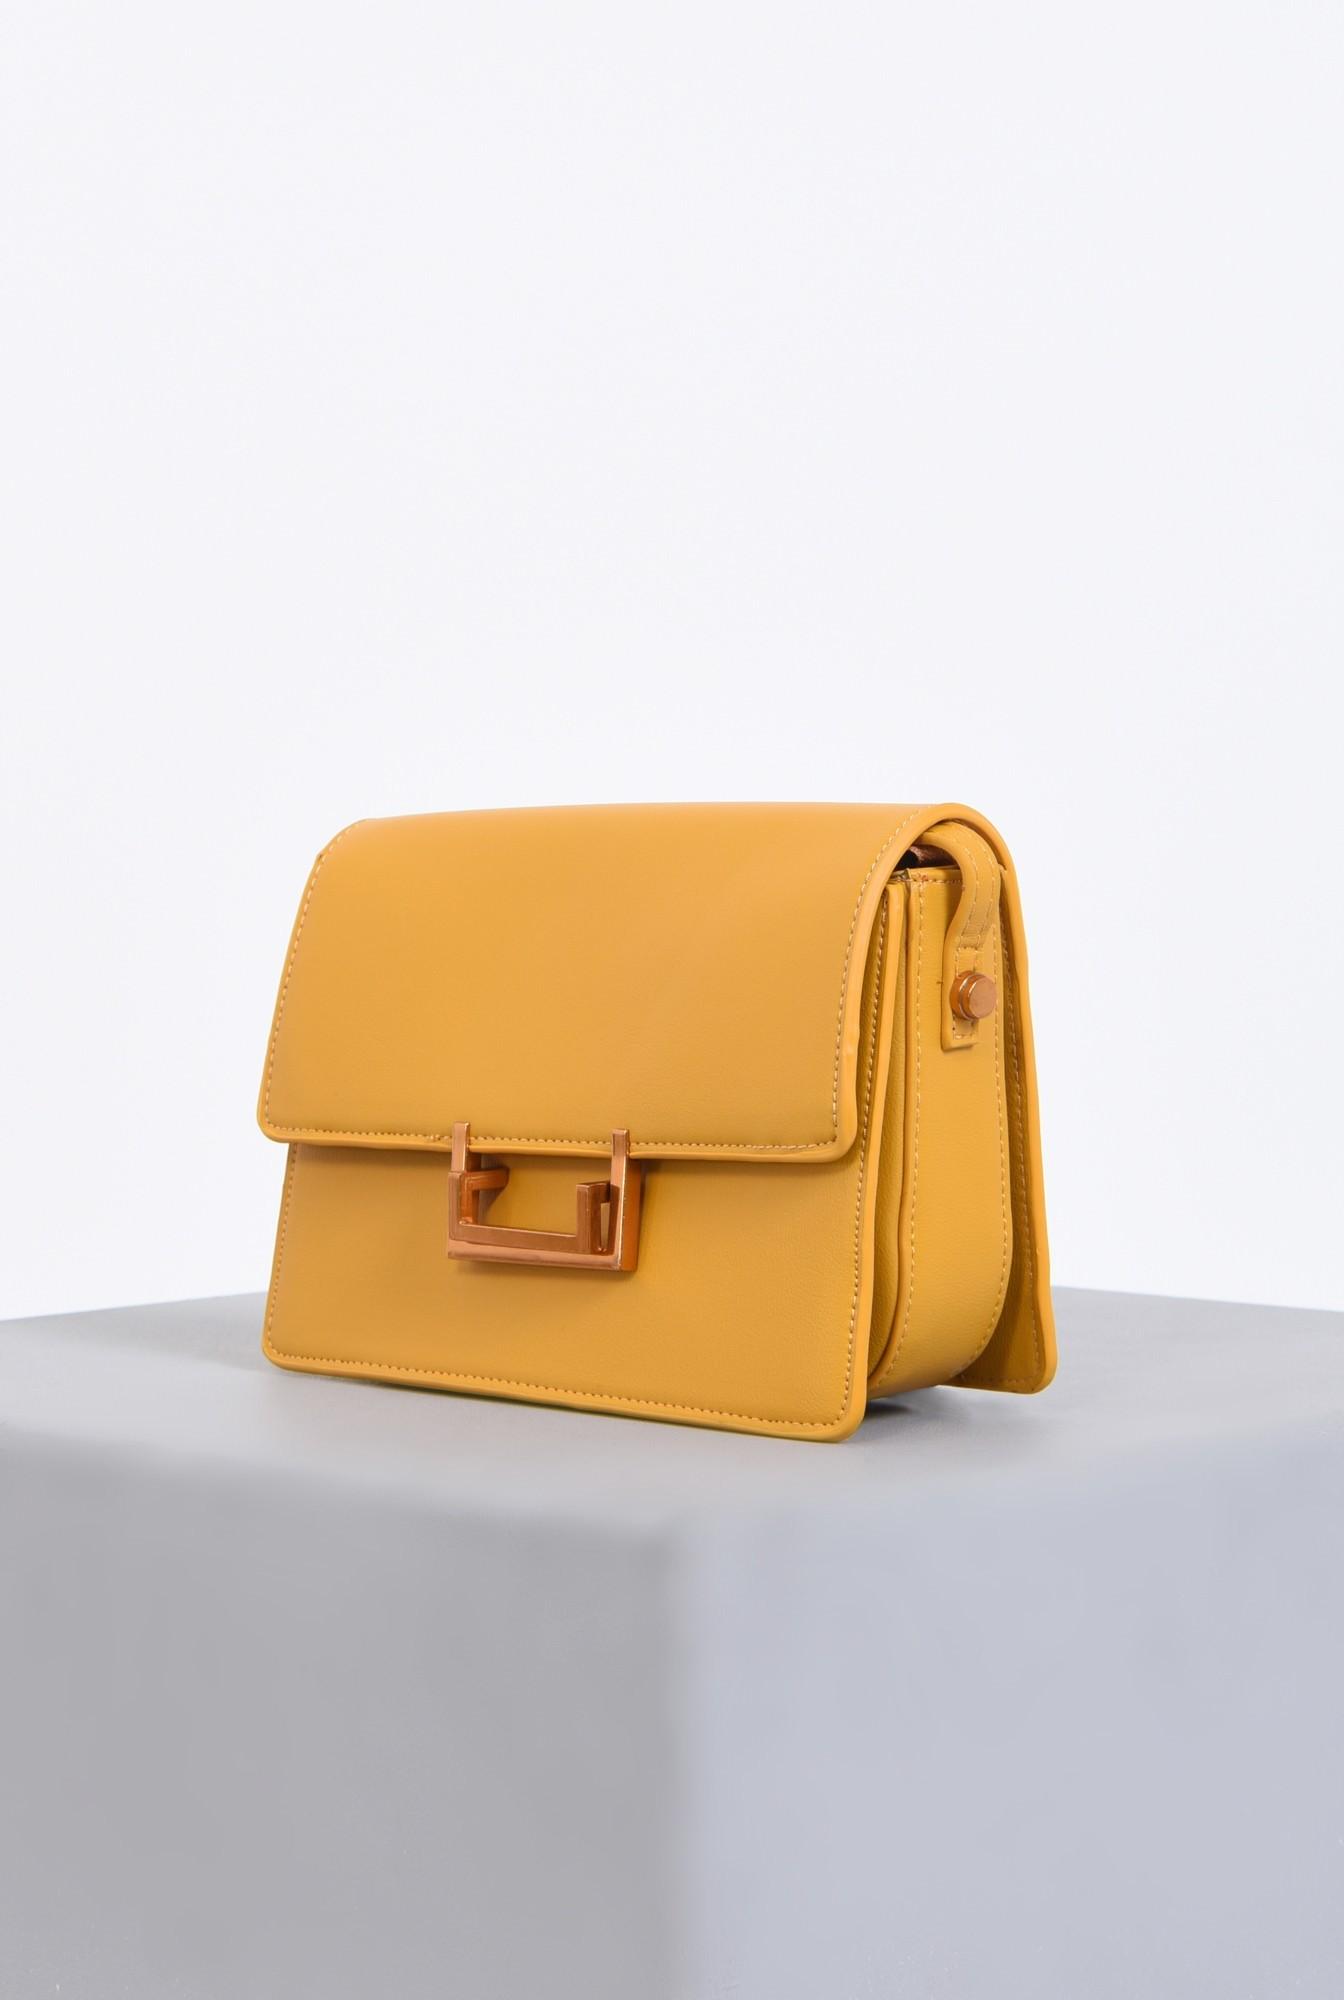 1 - geanta casual, mustar, medie, accesorii